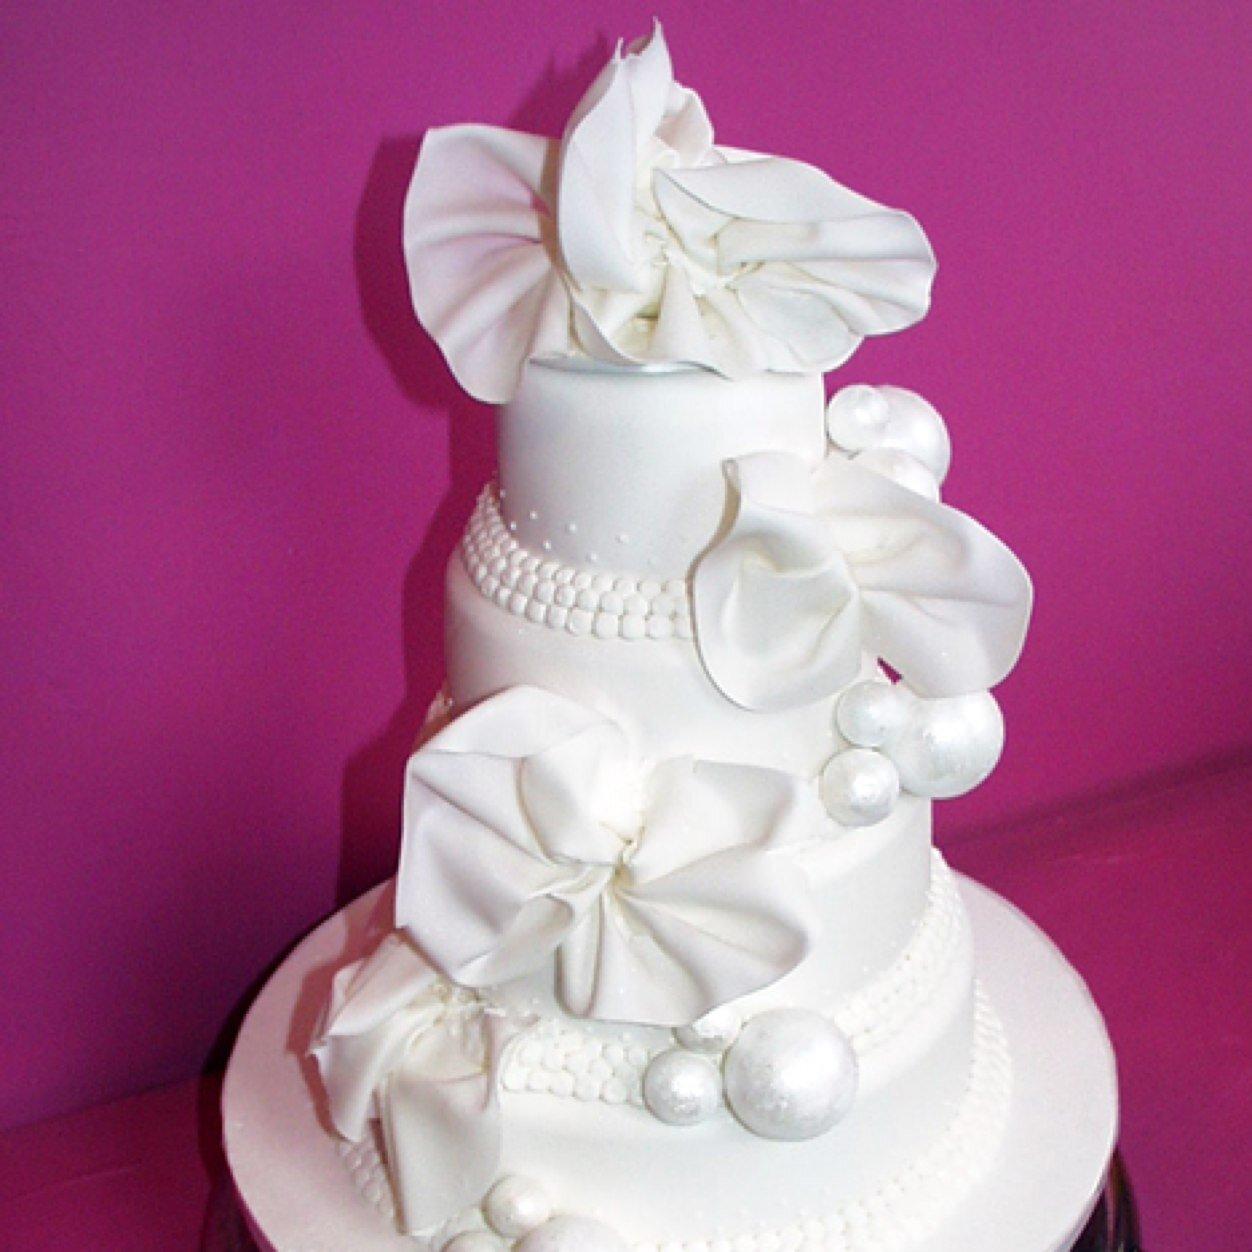 Occasion Cakes on Twitter Fantastic frozen cakes occasioncakesuk